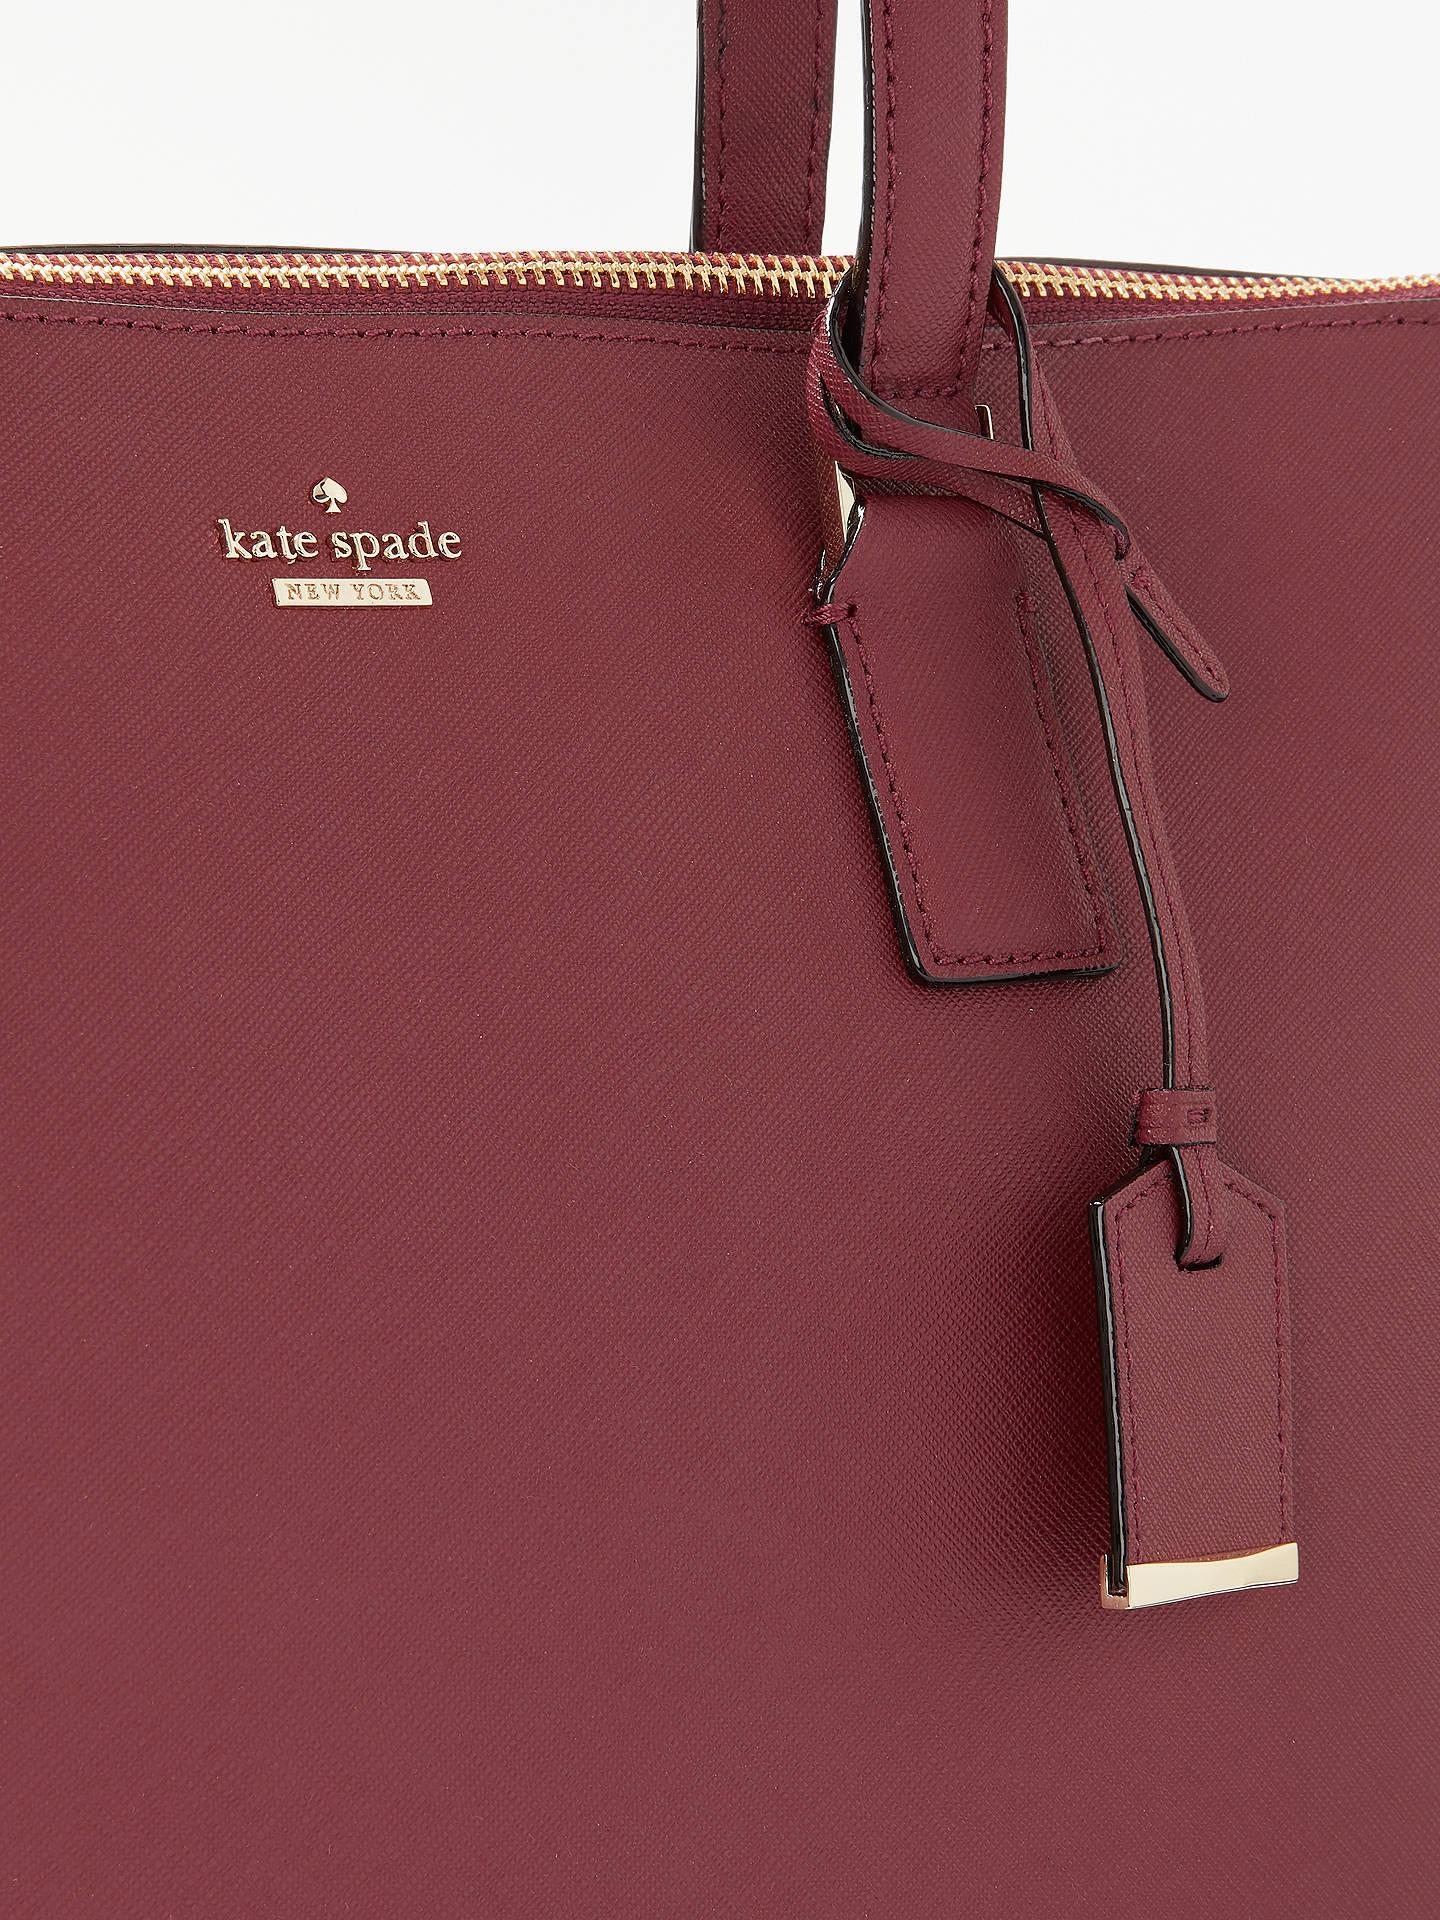 aee8ba2c9c28 ... Buy kate spade new york Cameron Street Lucie Leather Shoulder Bag